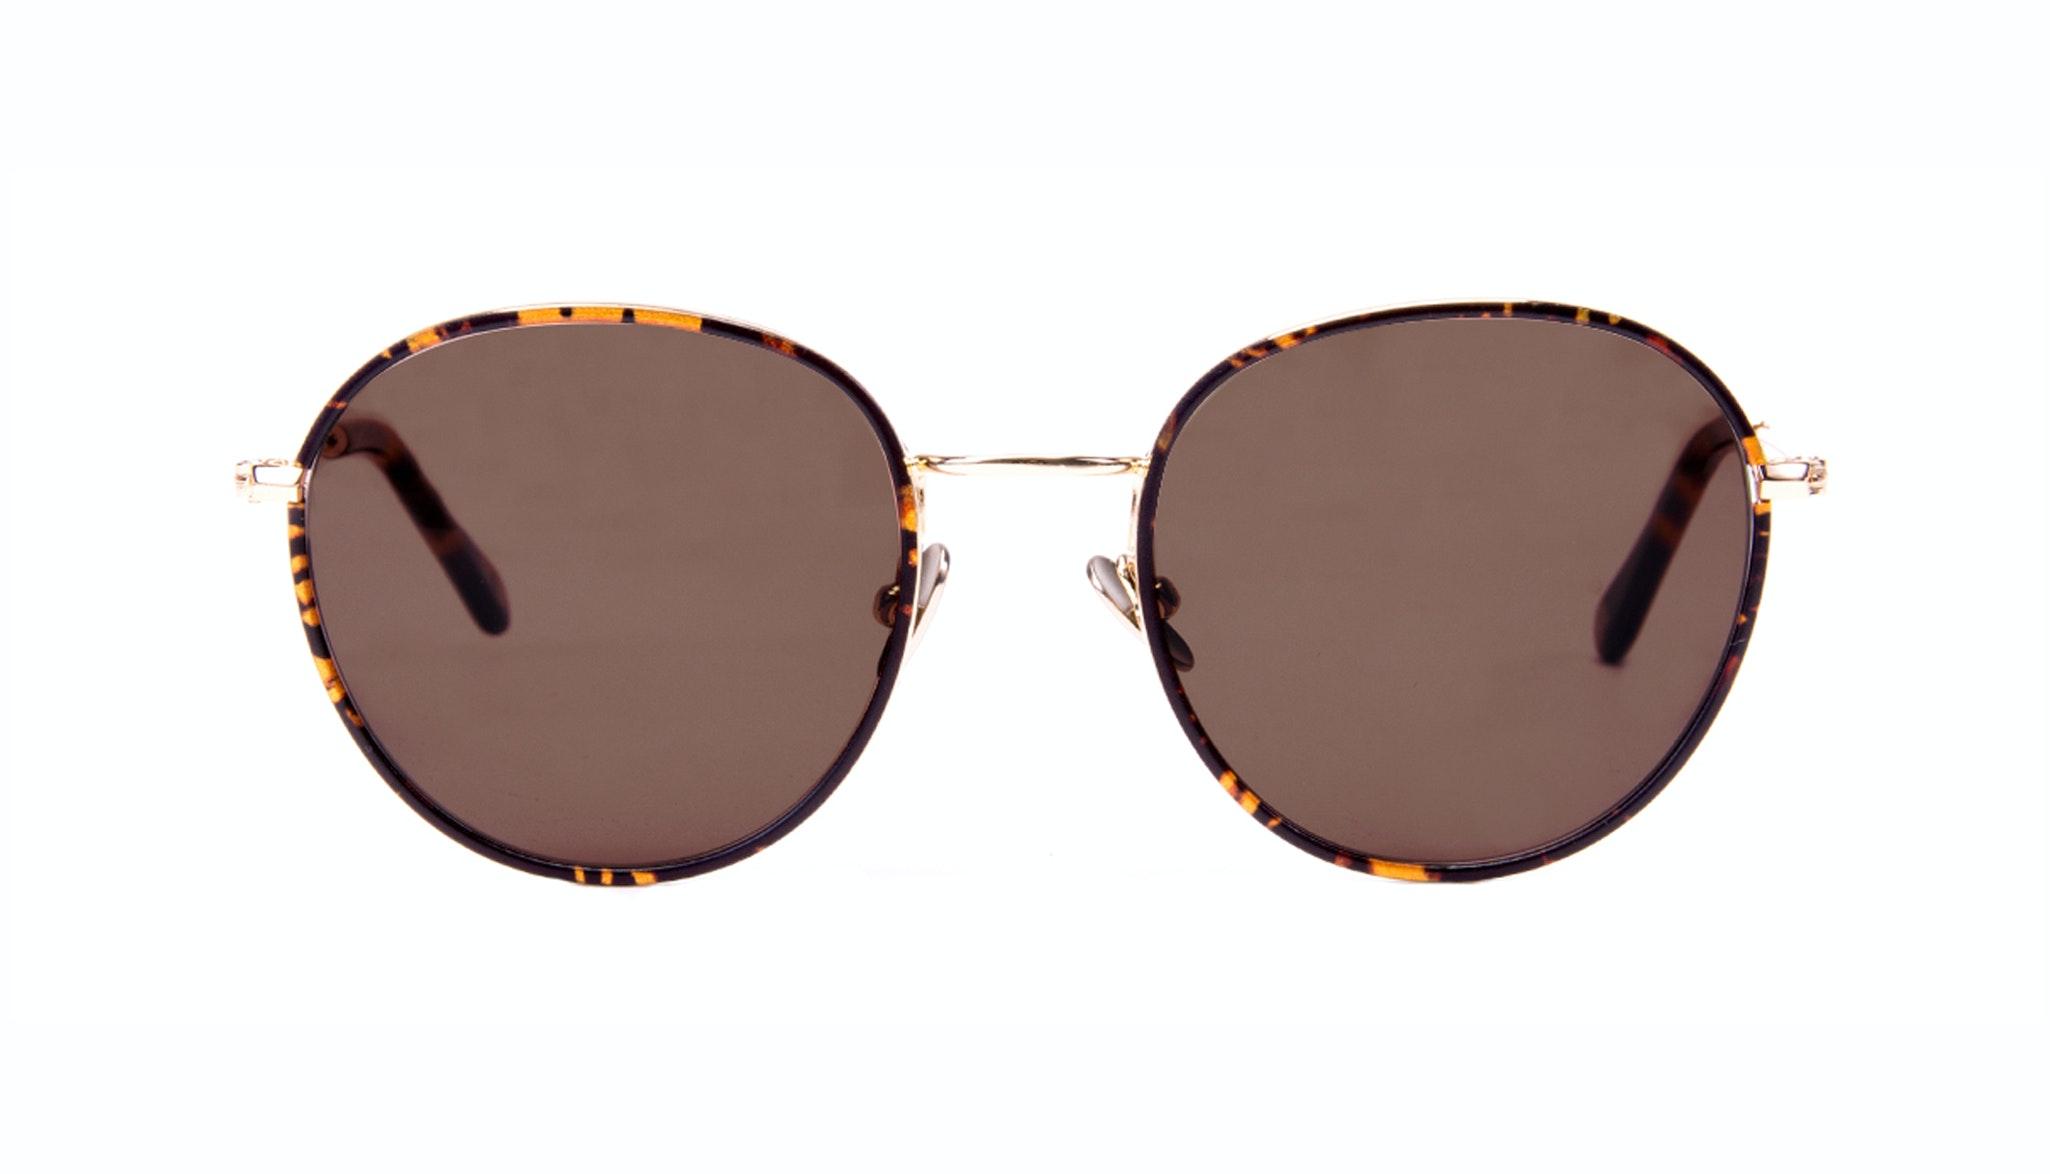 aviator round sunglasses  Women\u0027s Sunglasses - Subrosa in Fauve